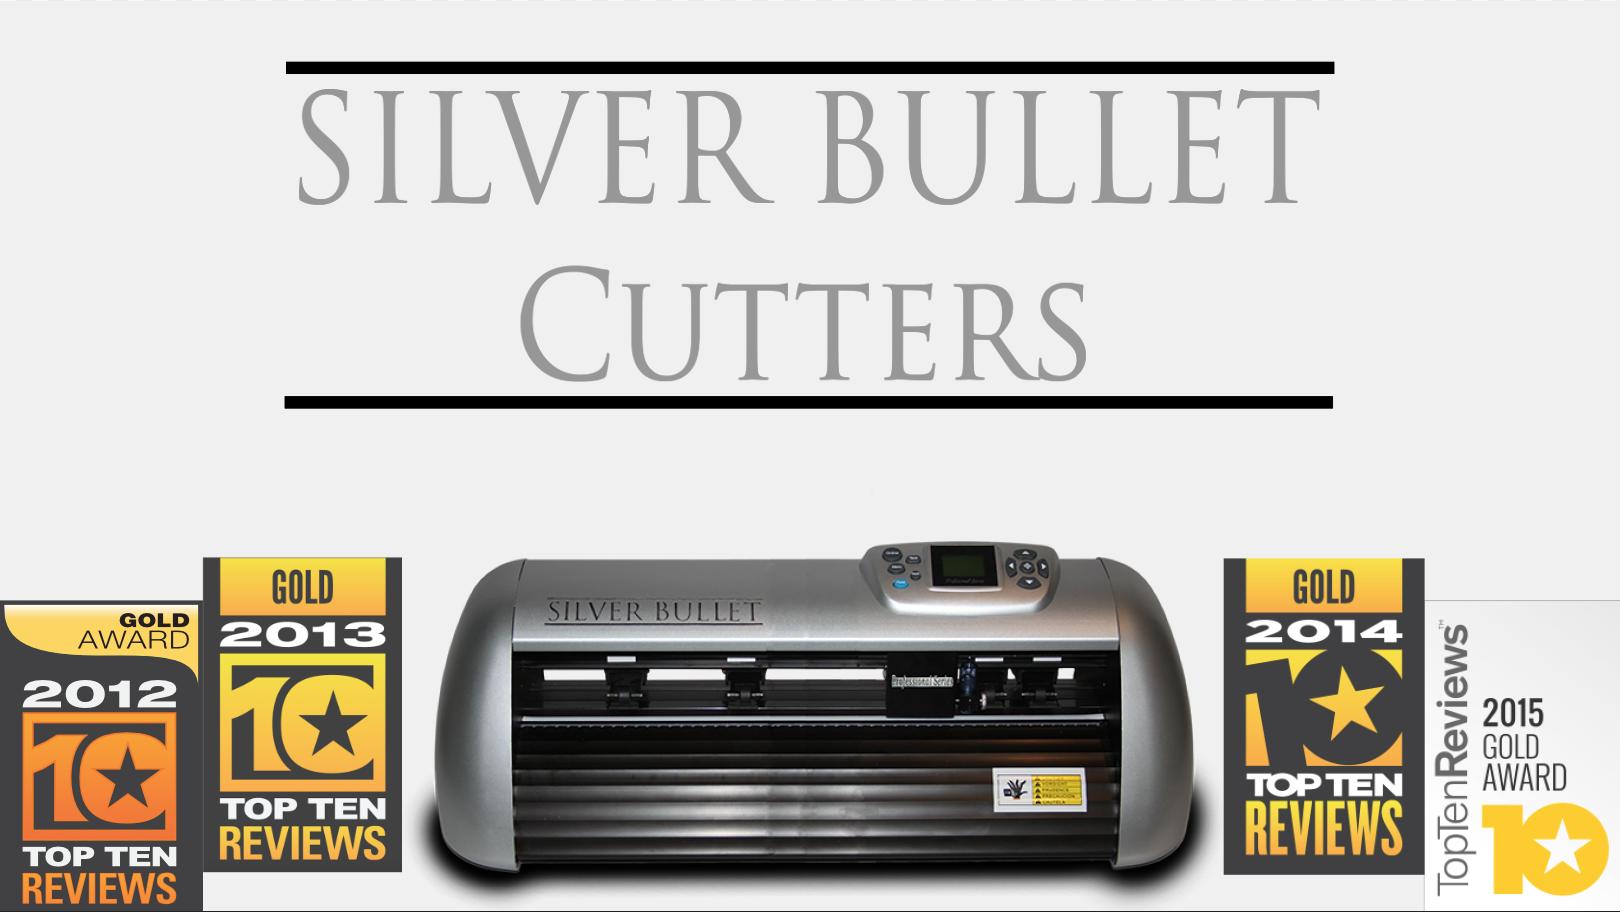 Silver Bullet Cutters